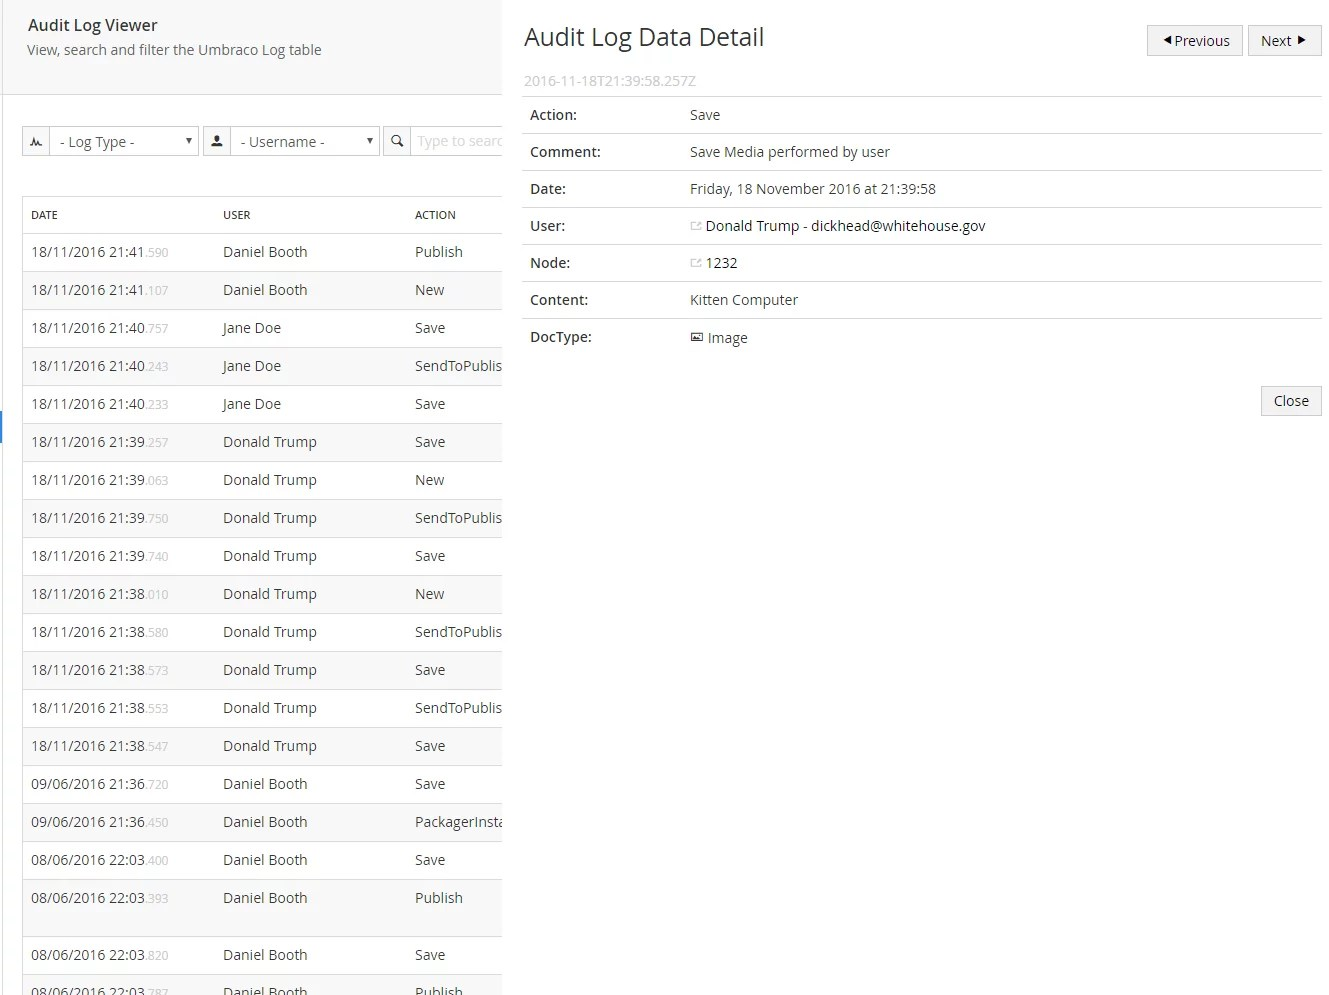 Diplo Audit Log Data Table Umbracolog Viewer For Umbraco Cms